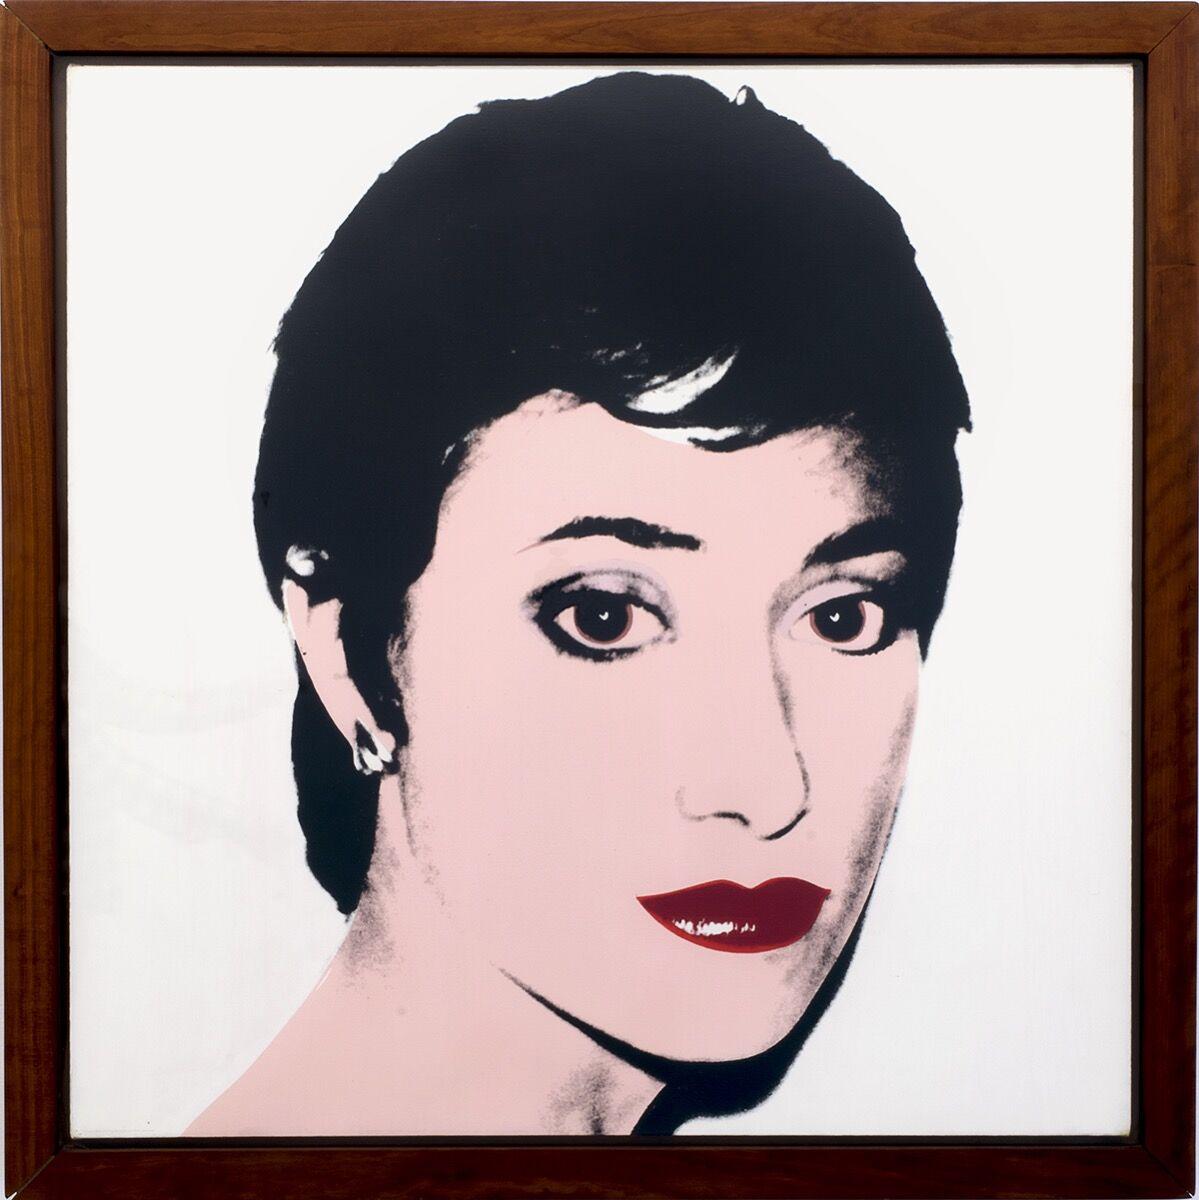 Andy Warhol, Portrait of Helene Verin, 1980. Courtesy of Helene Verin.